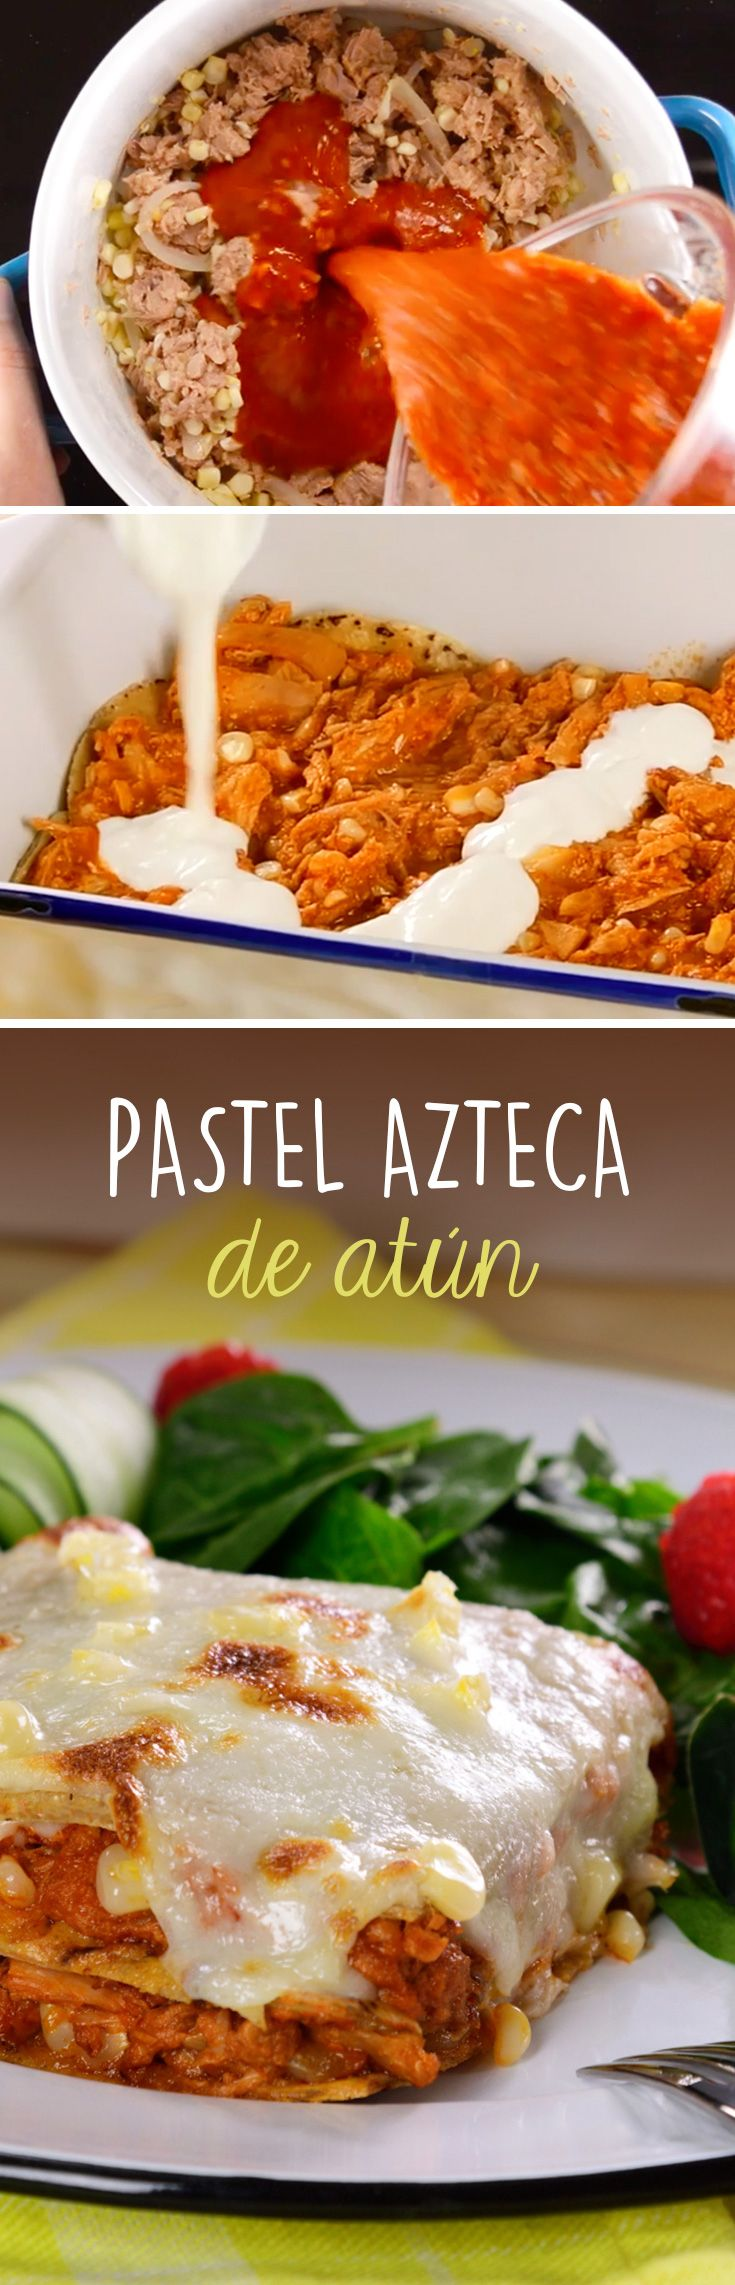 Pastel azteca de atun